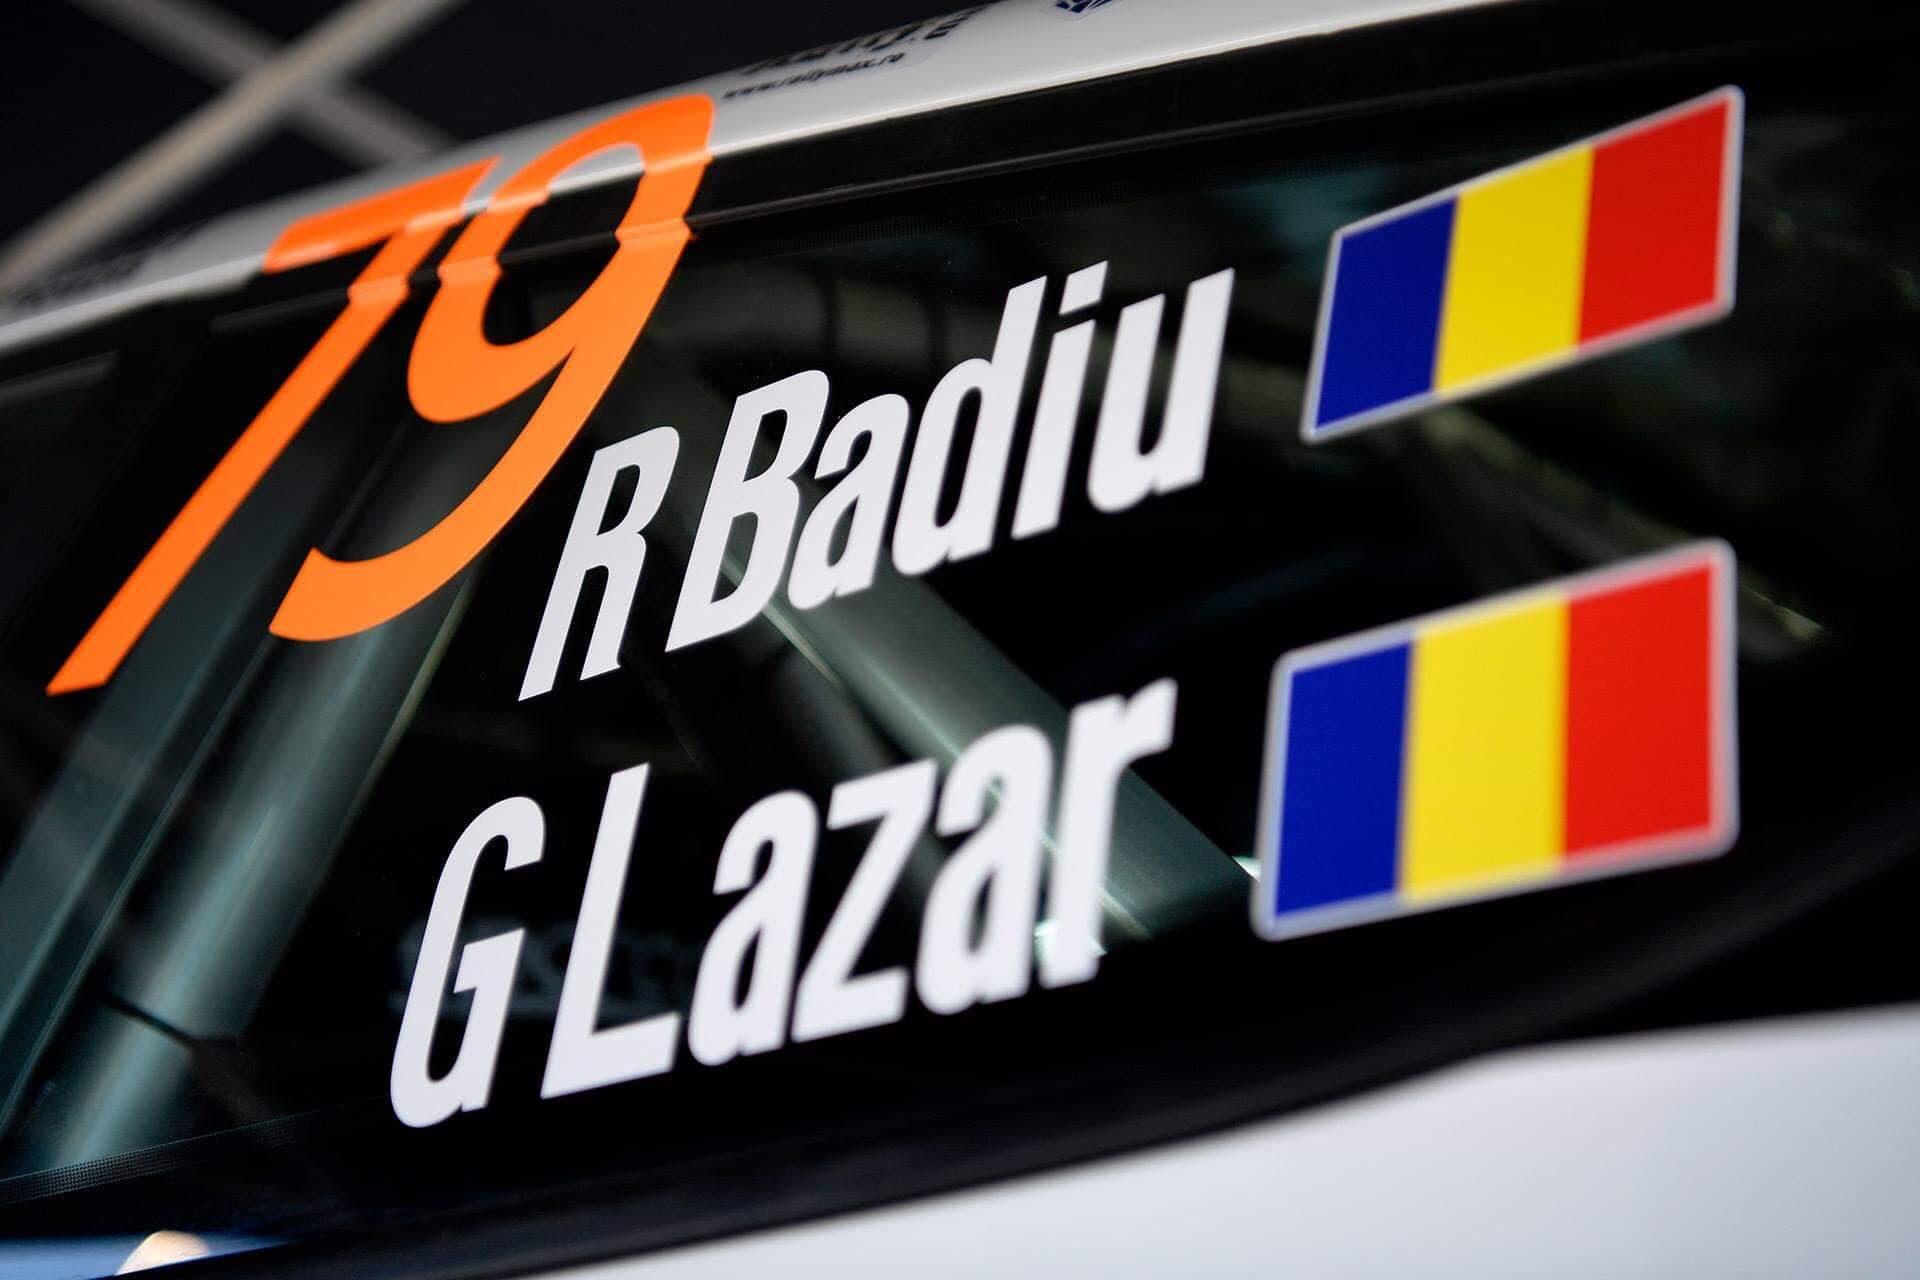 Raul Badiu si Gabriel Lazar au testat in Norvegia inaintea Raliului Suediei